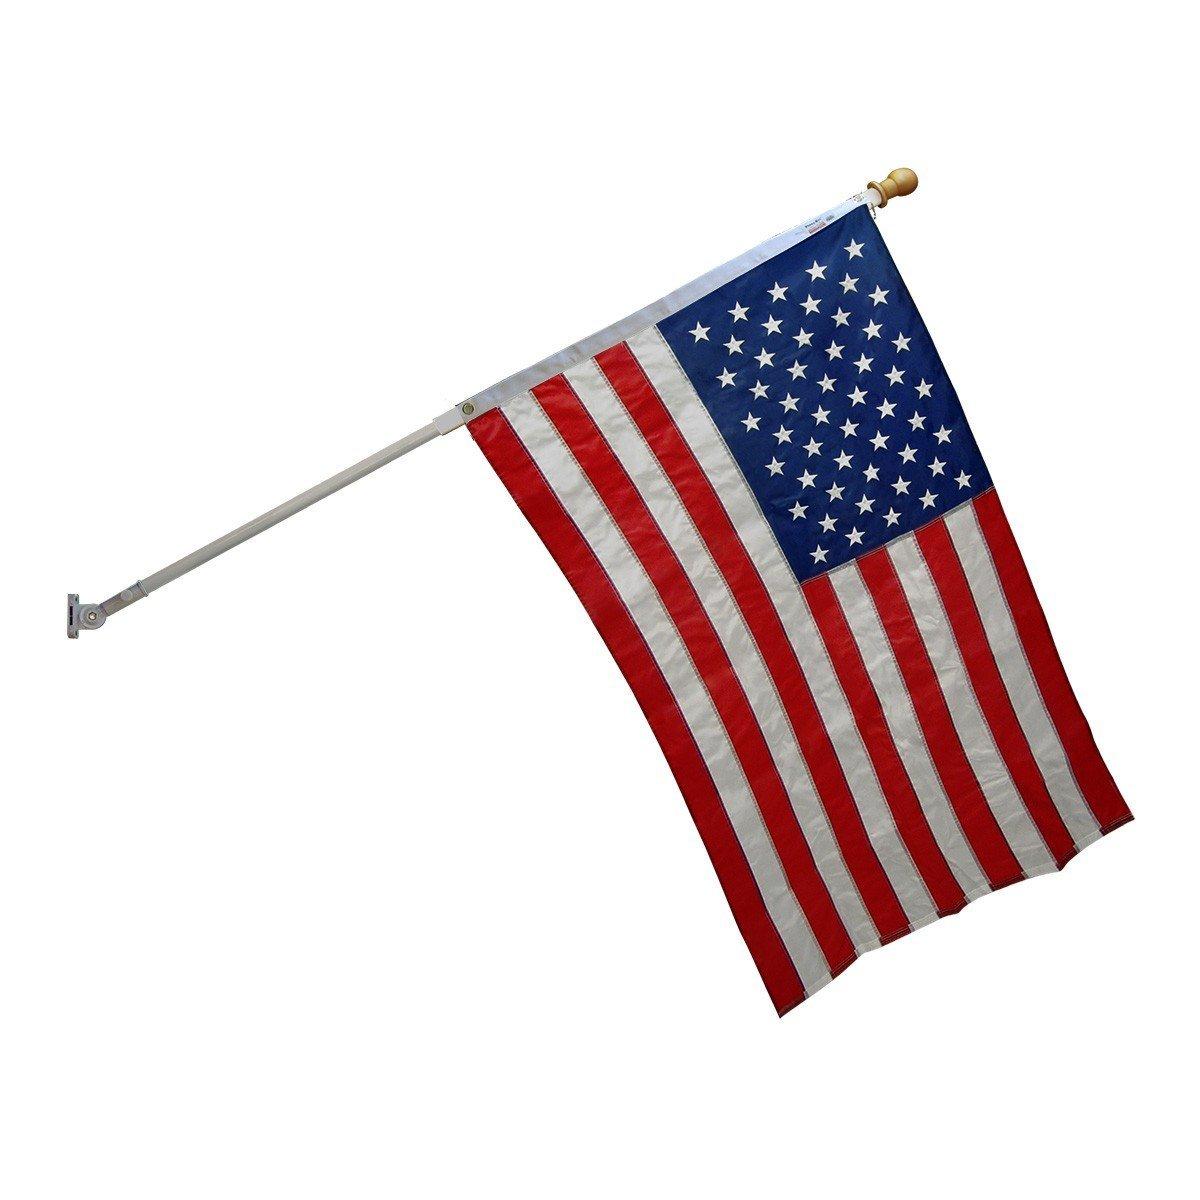 Super Tough Nylon Flagpole Kit with White 6ft Spinner Pole, US Made Sewn Nylon Flag, Sturdy Bracket